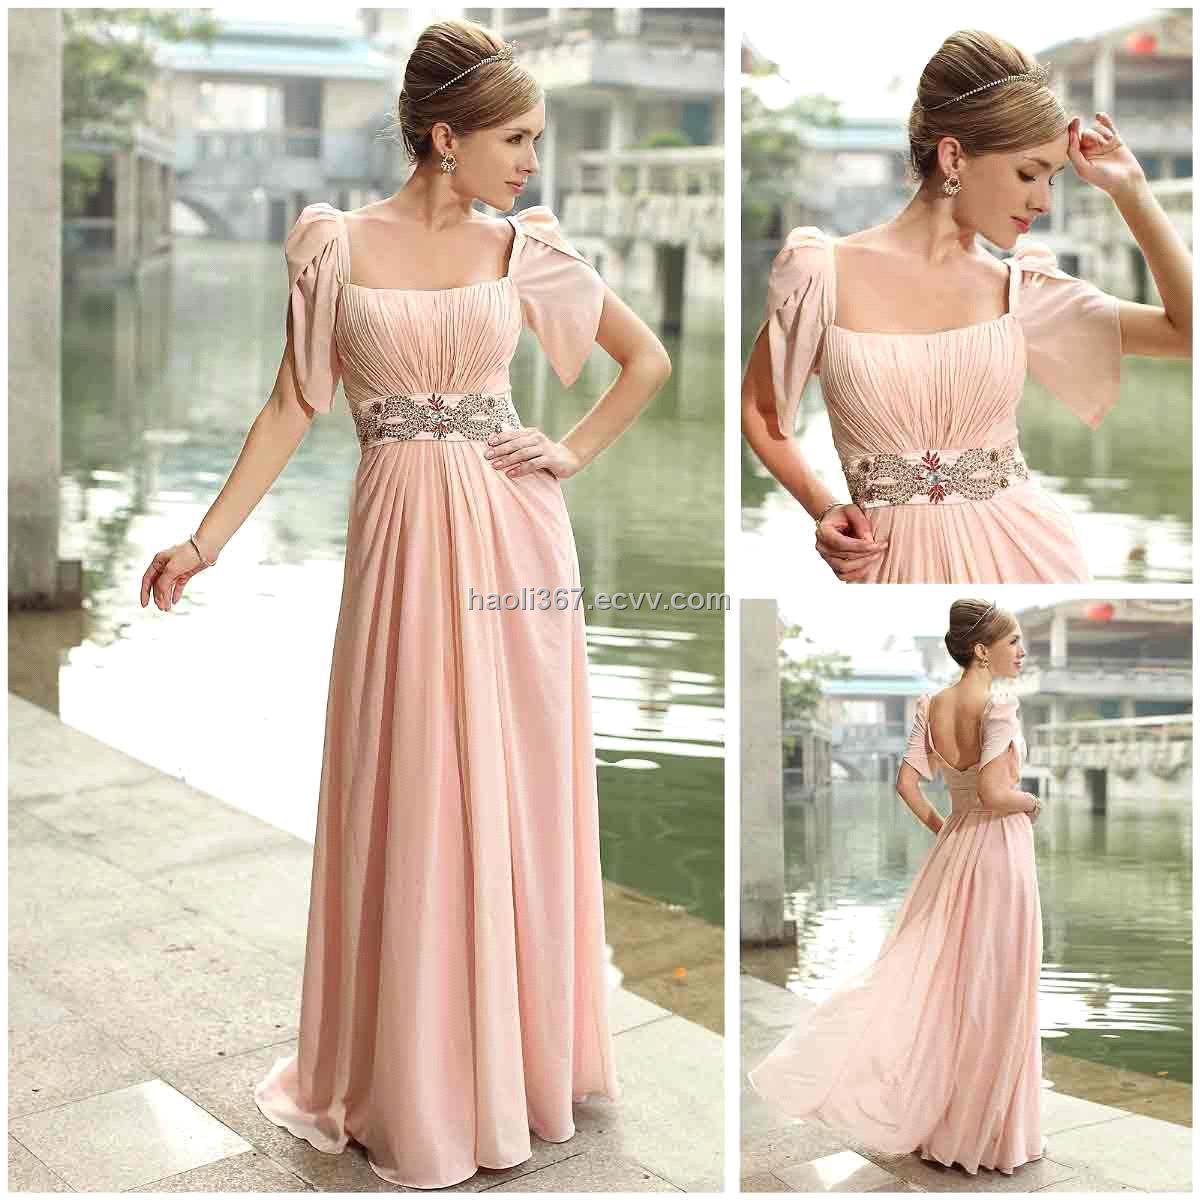 Doris Elegant Prom Formal Dress 30291 Purchasing Souring Agent